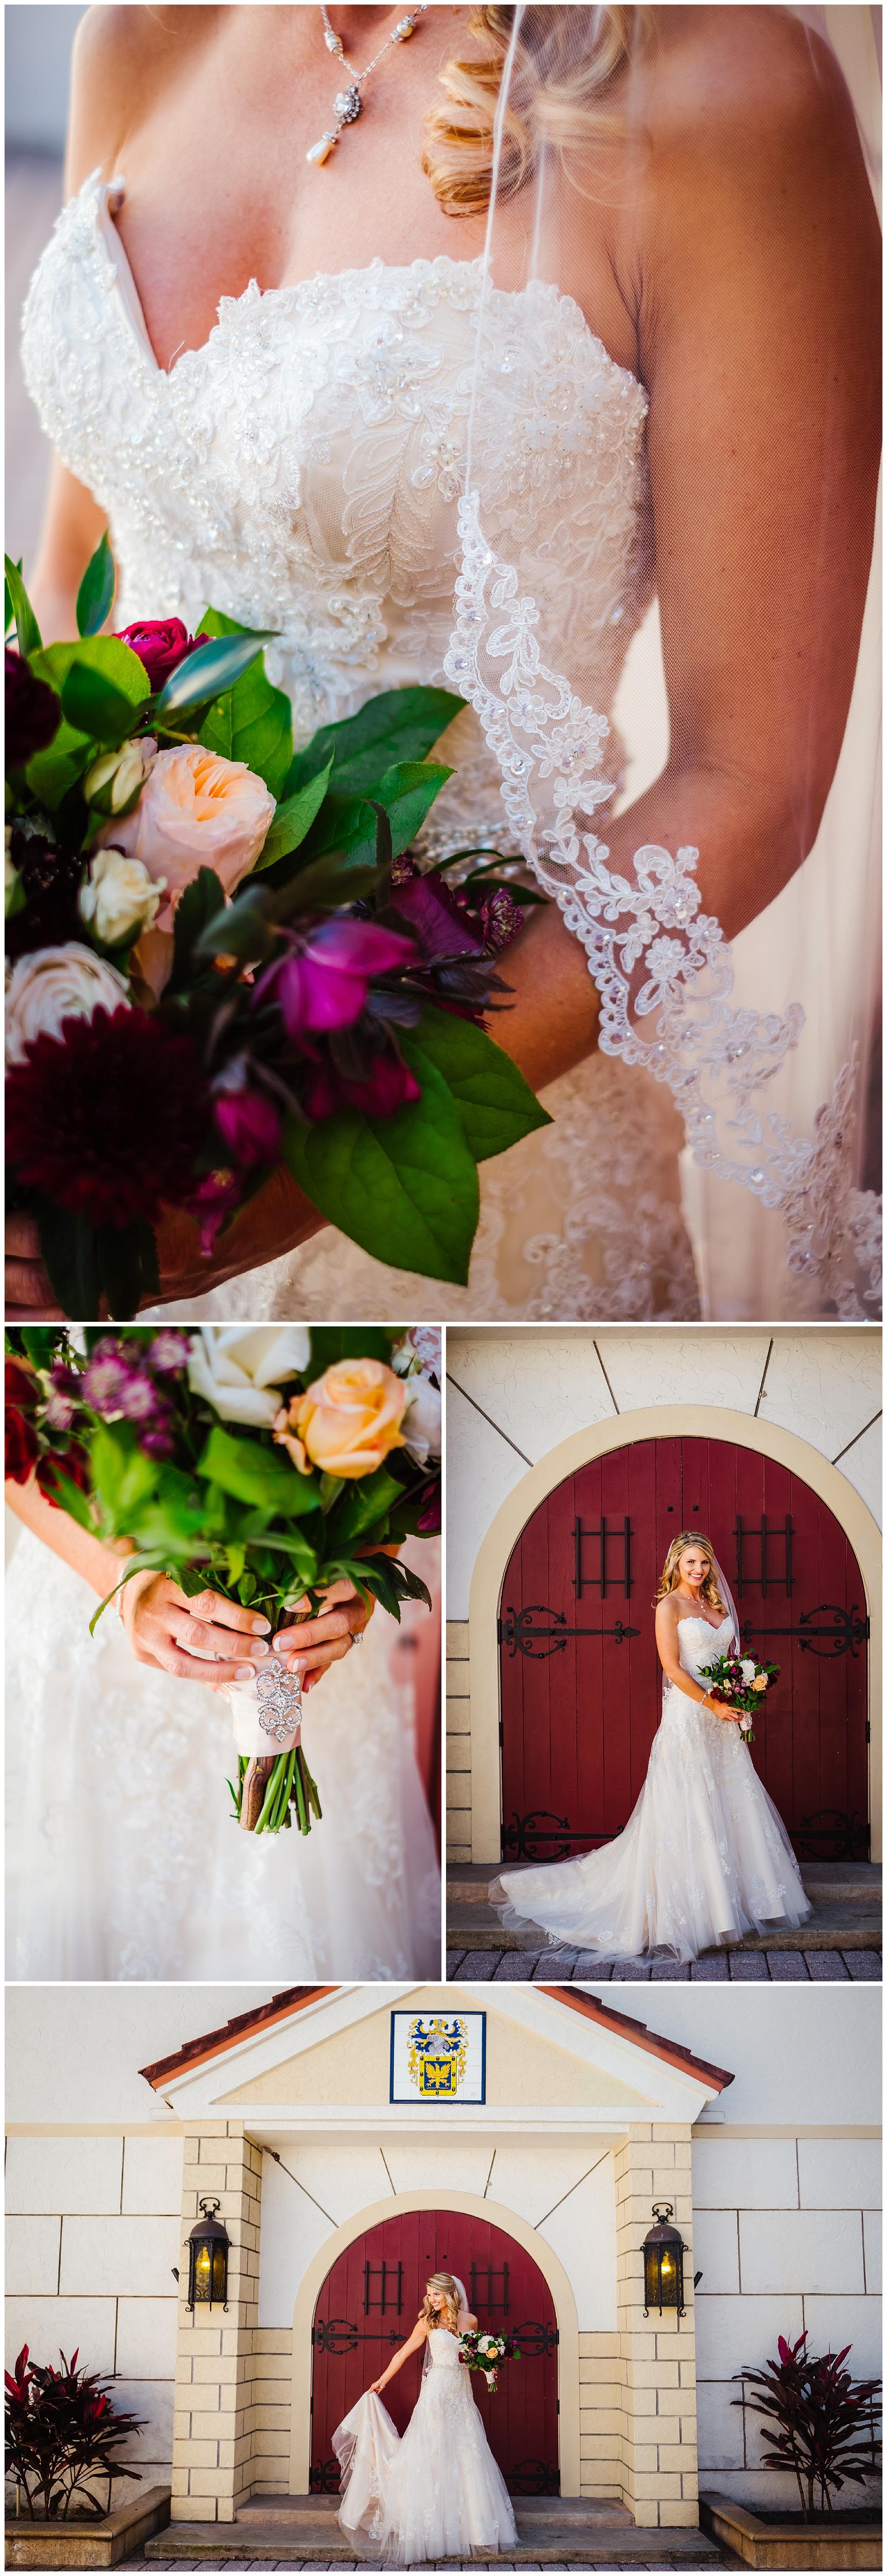 tampa-bradenton-wedding-photographer-south-florida-museum-classic-blush-gold-alpacas-sparklers_0033.jpg